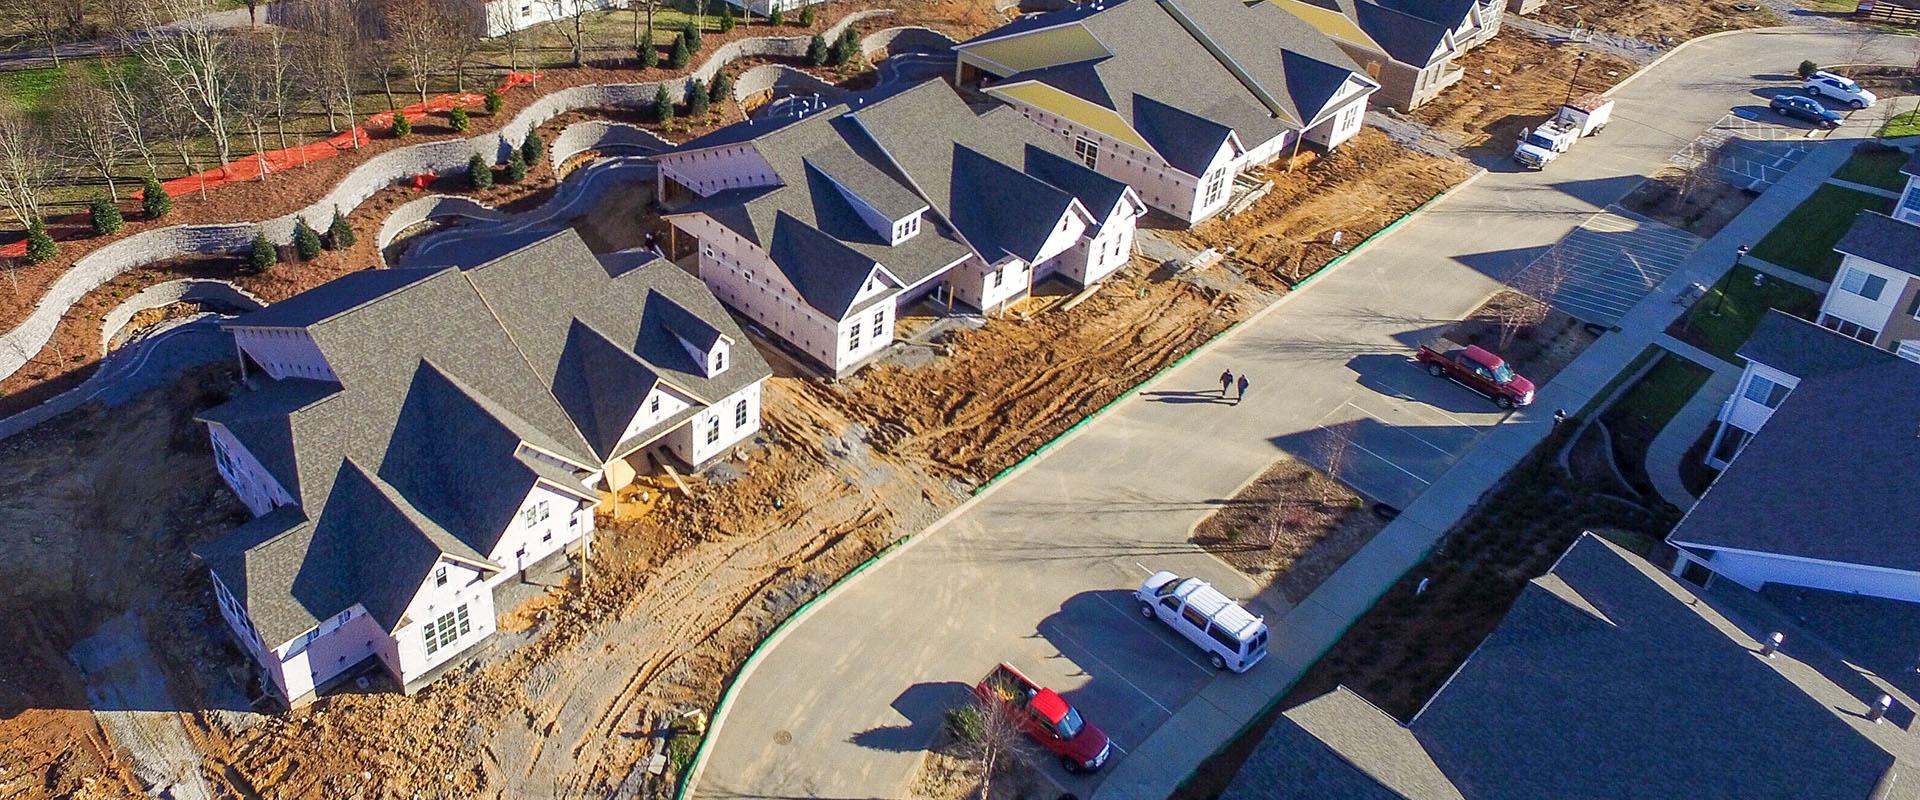 Property Management and Development   Brindley Construction